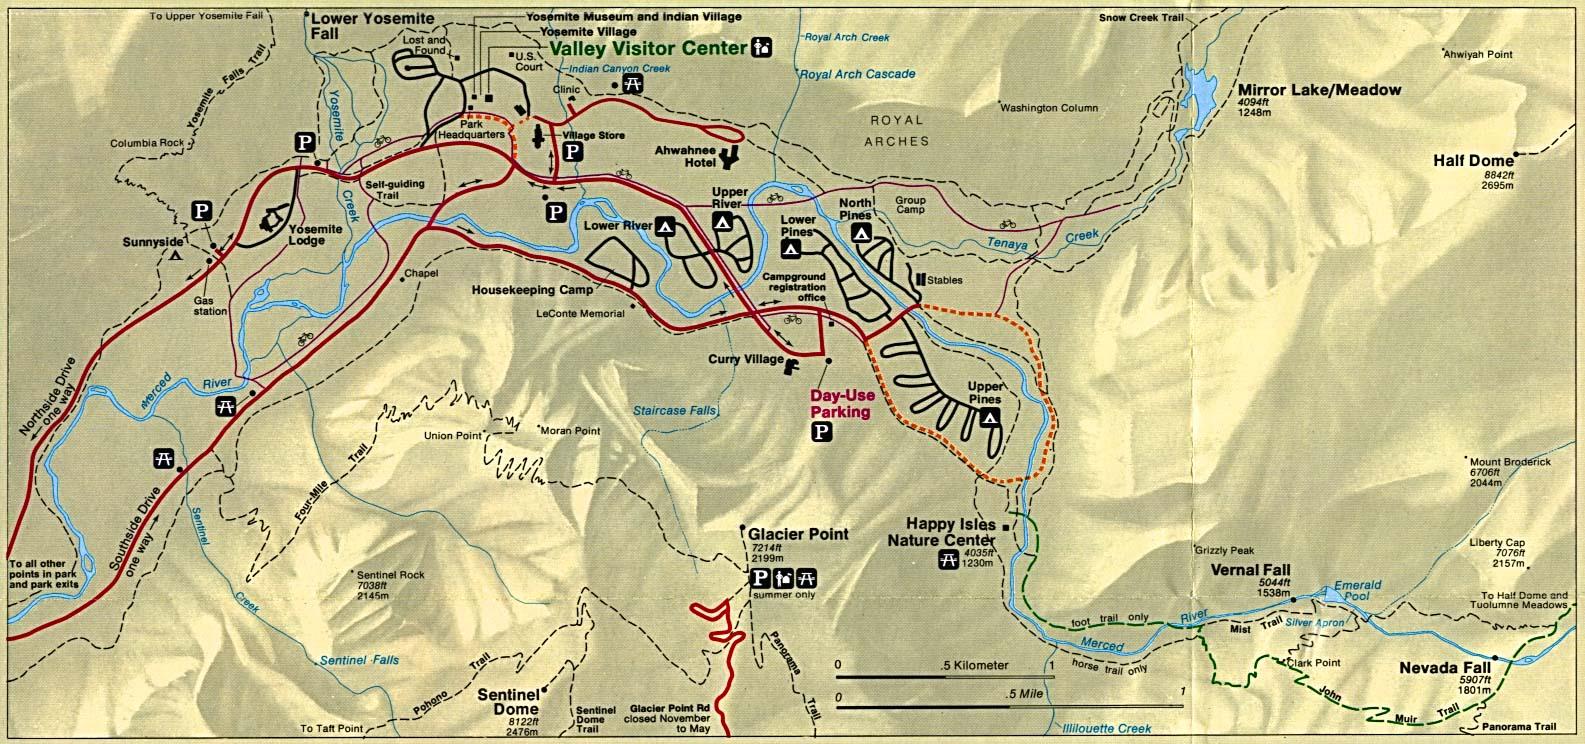 Detail Map of Yosemite National Park, California, United States